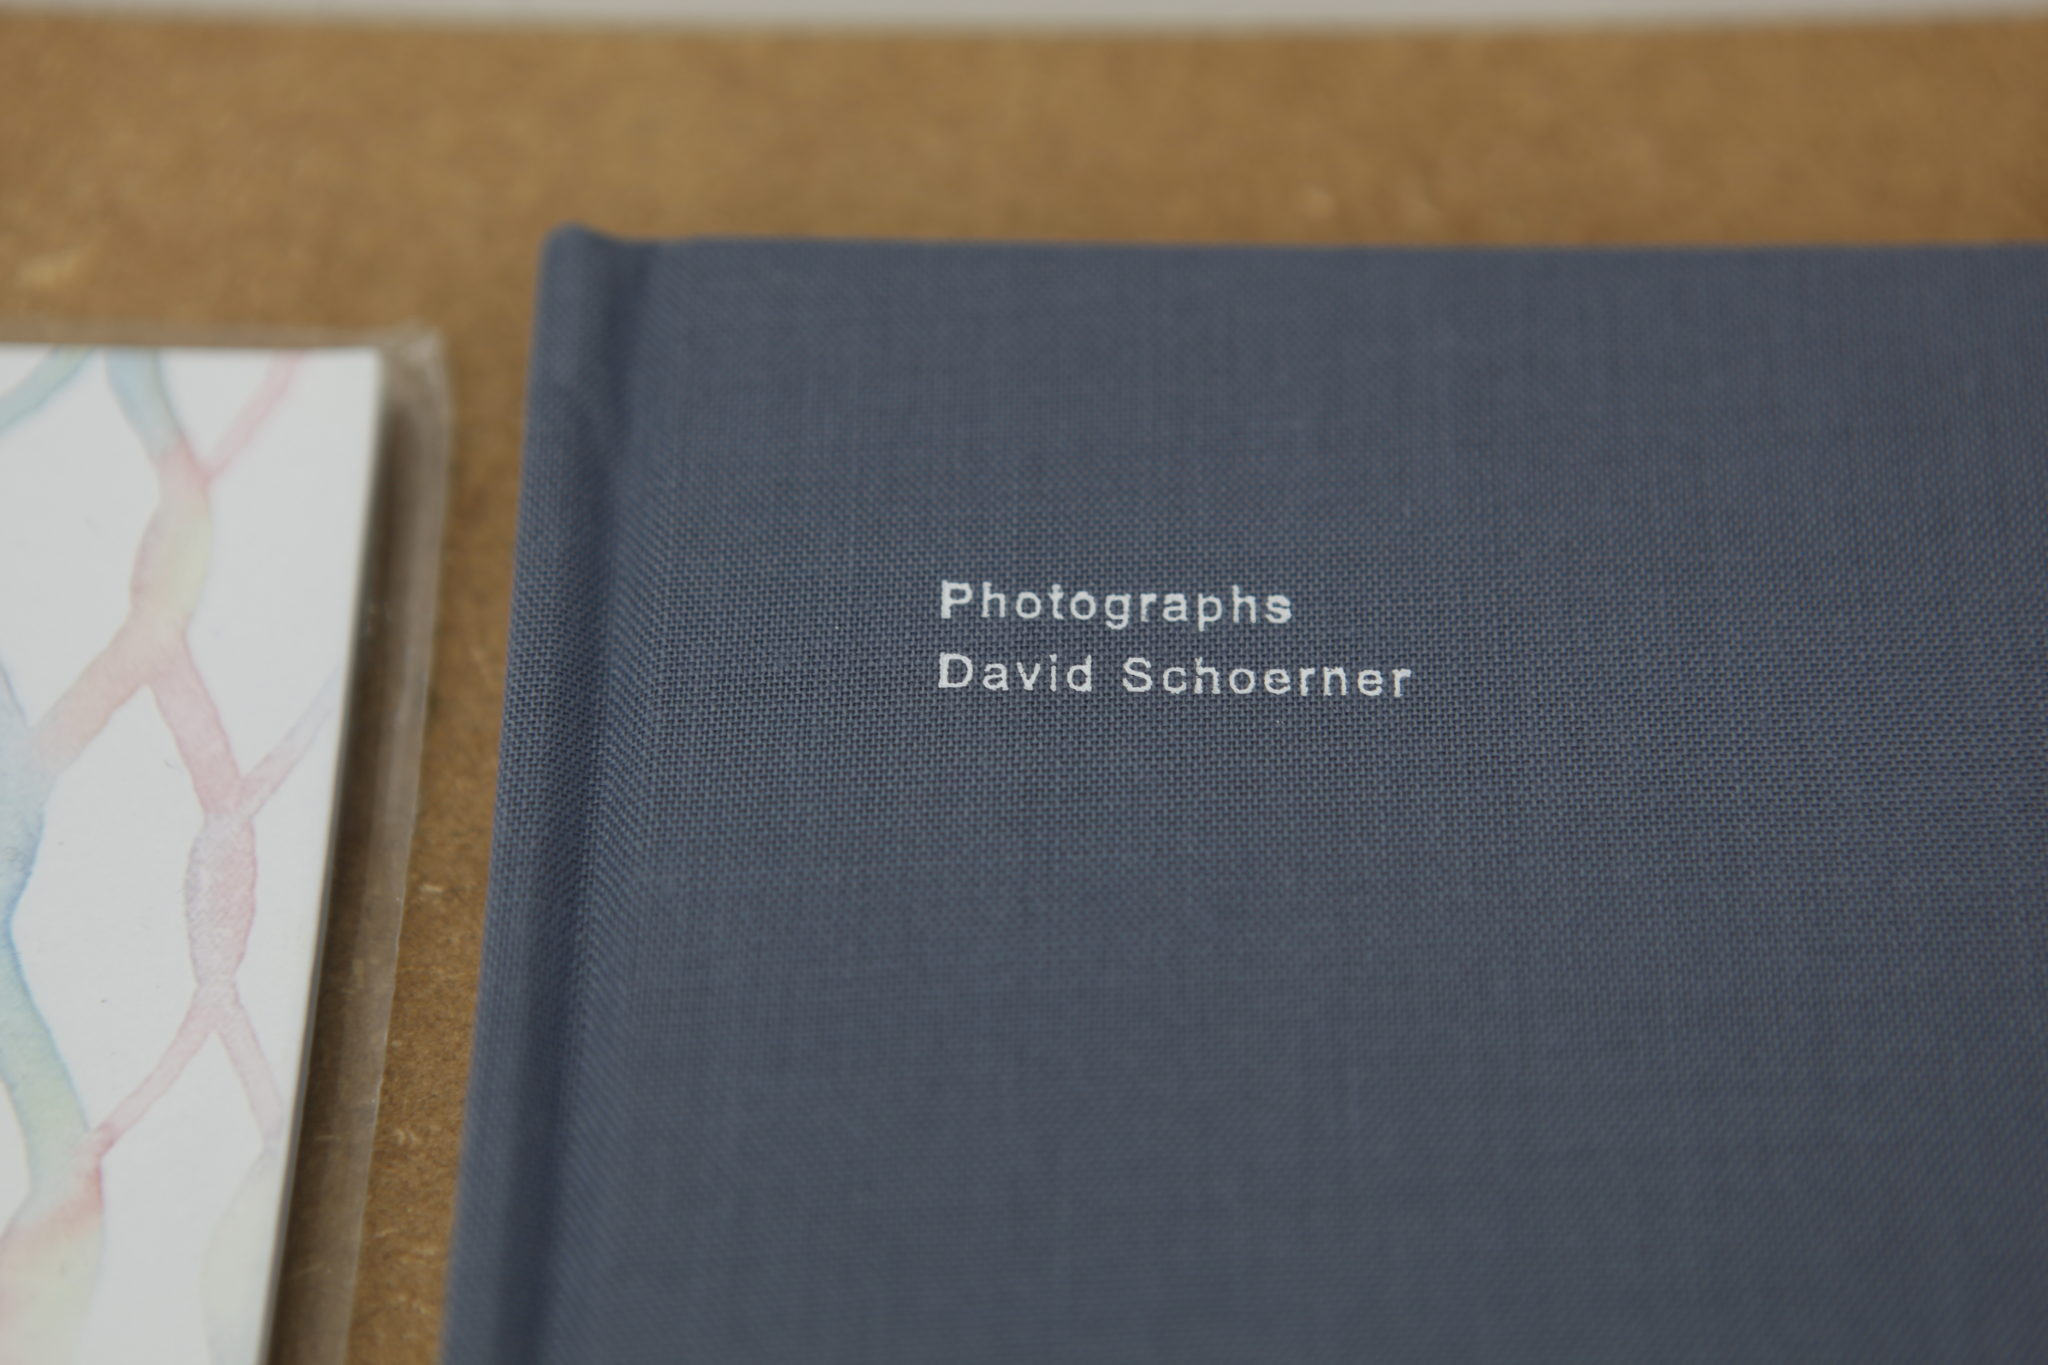 Photographs - David Schoerner